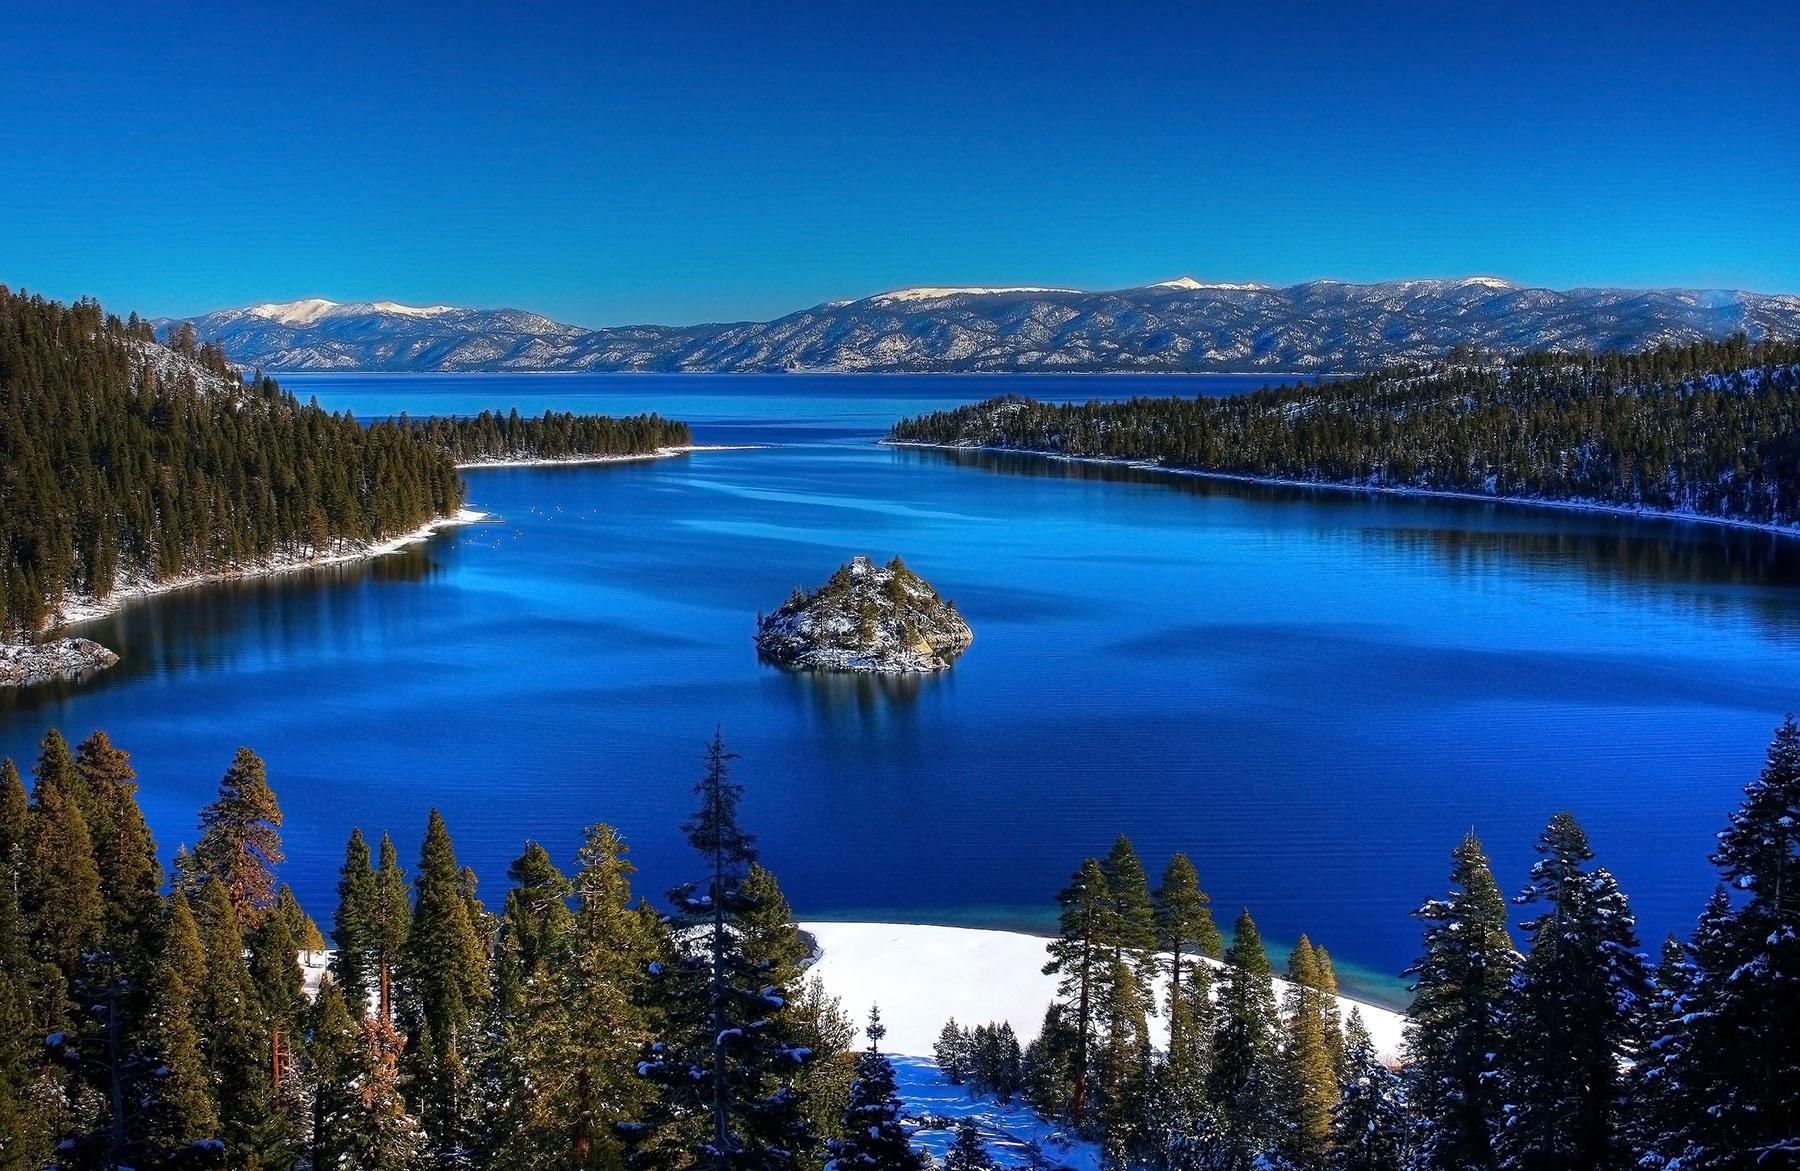 LakeTahoe2_winter_small.jpg